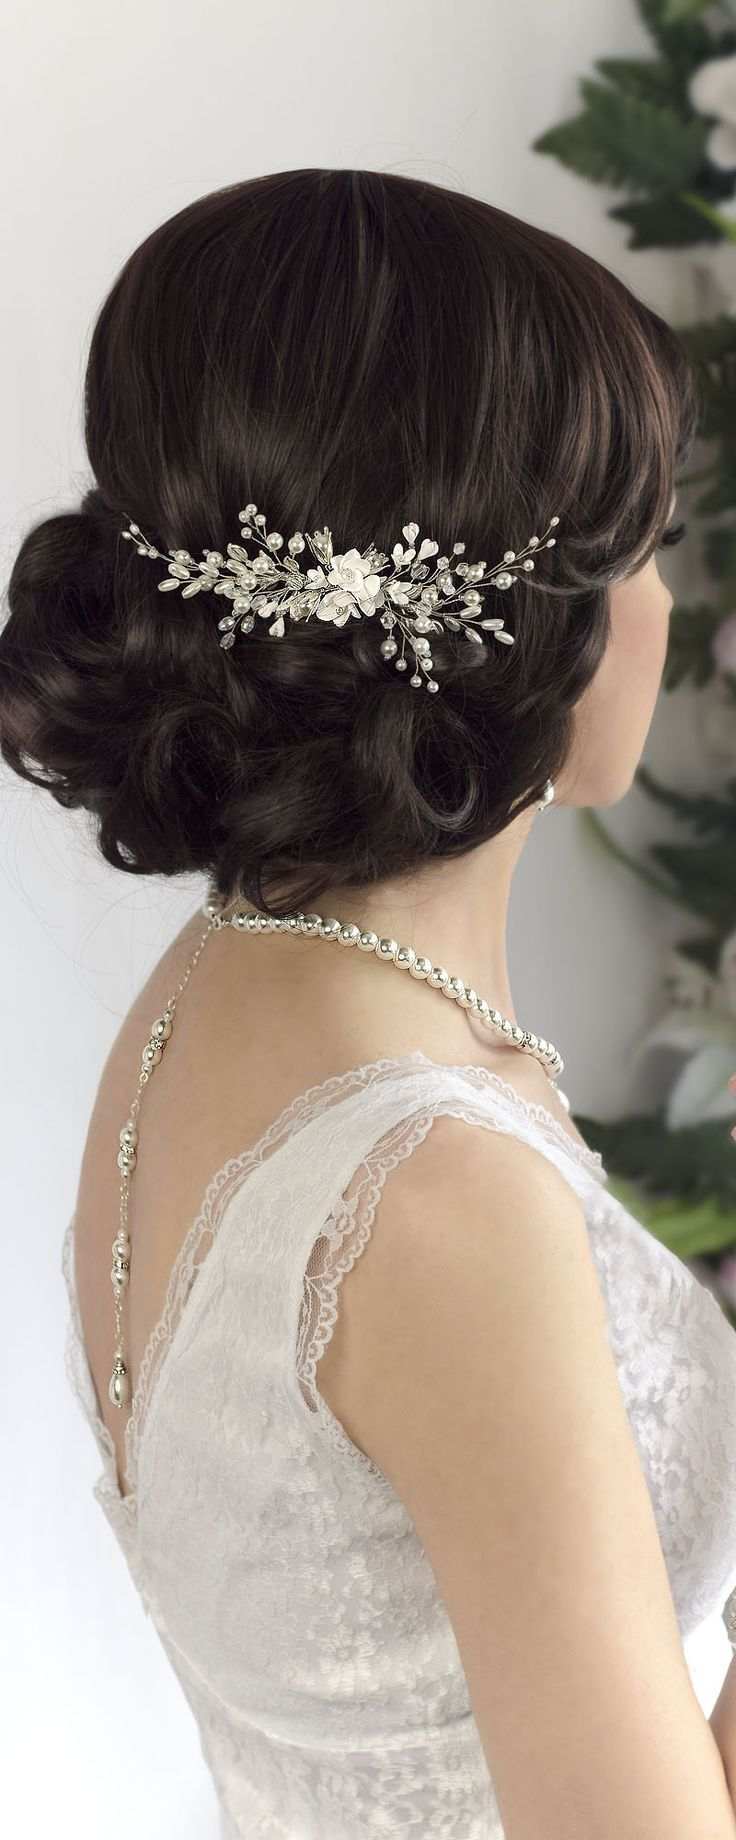 Bridal hair comb, wedding headpiece, bridal hair accessories. Handmade wedding p...